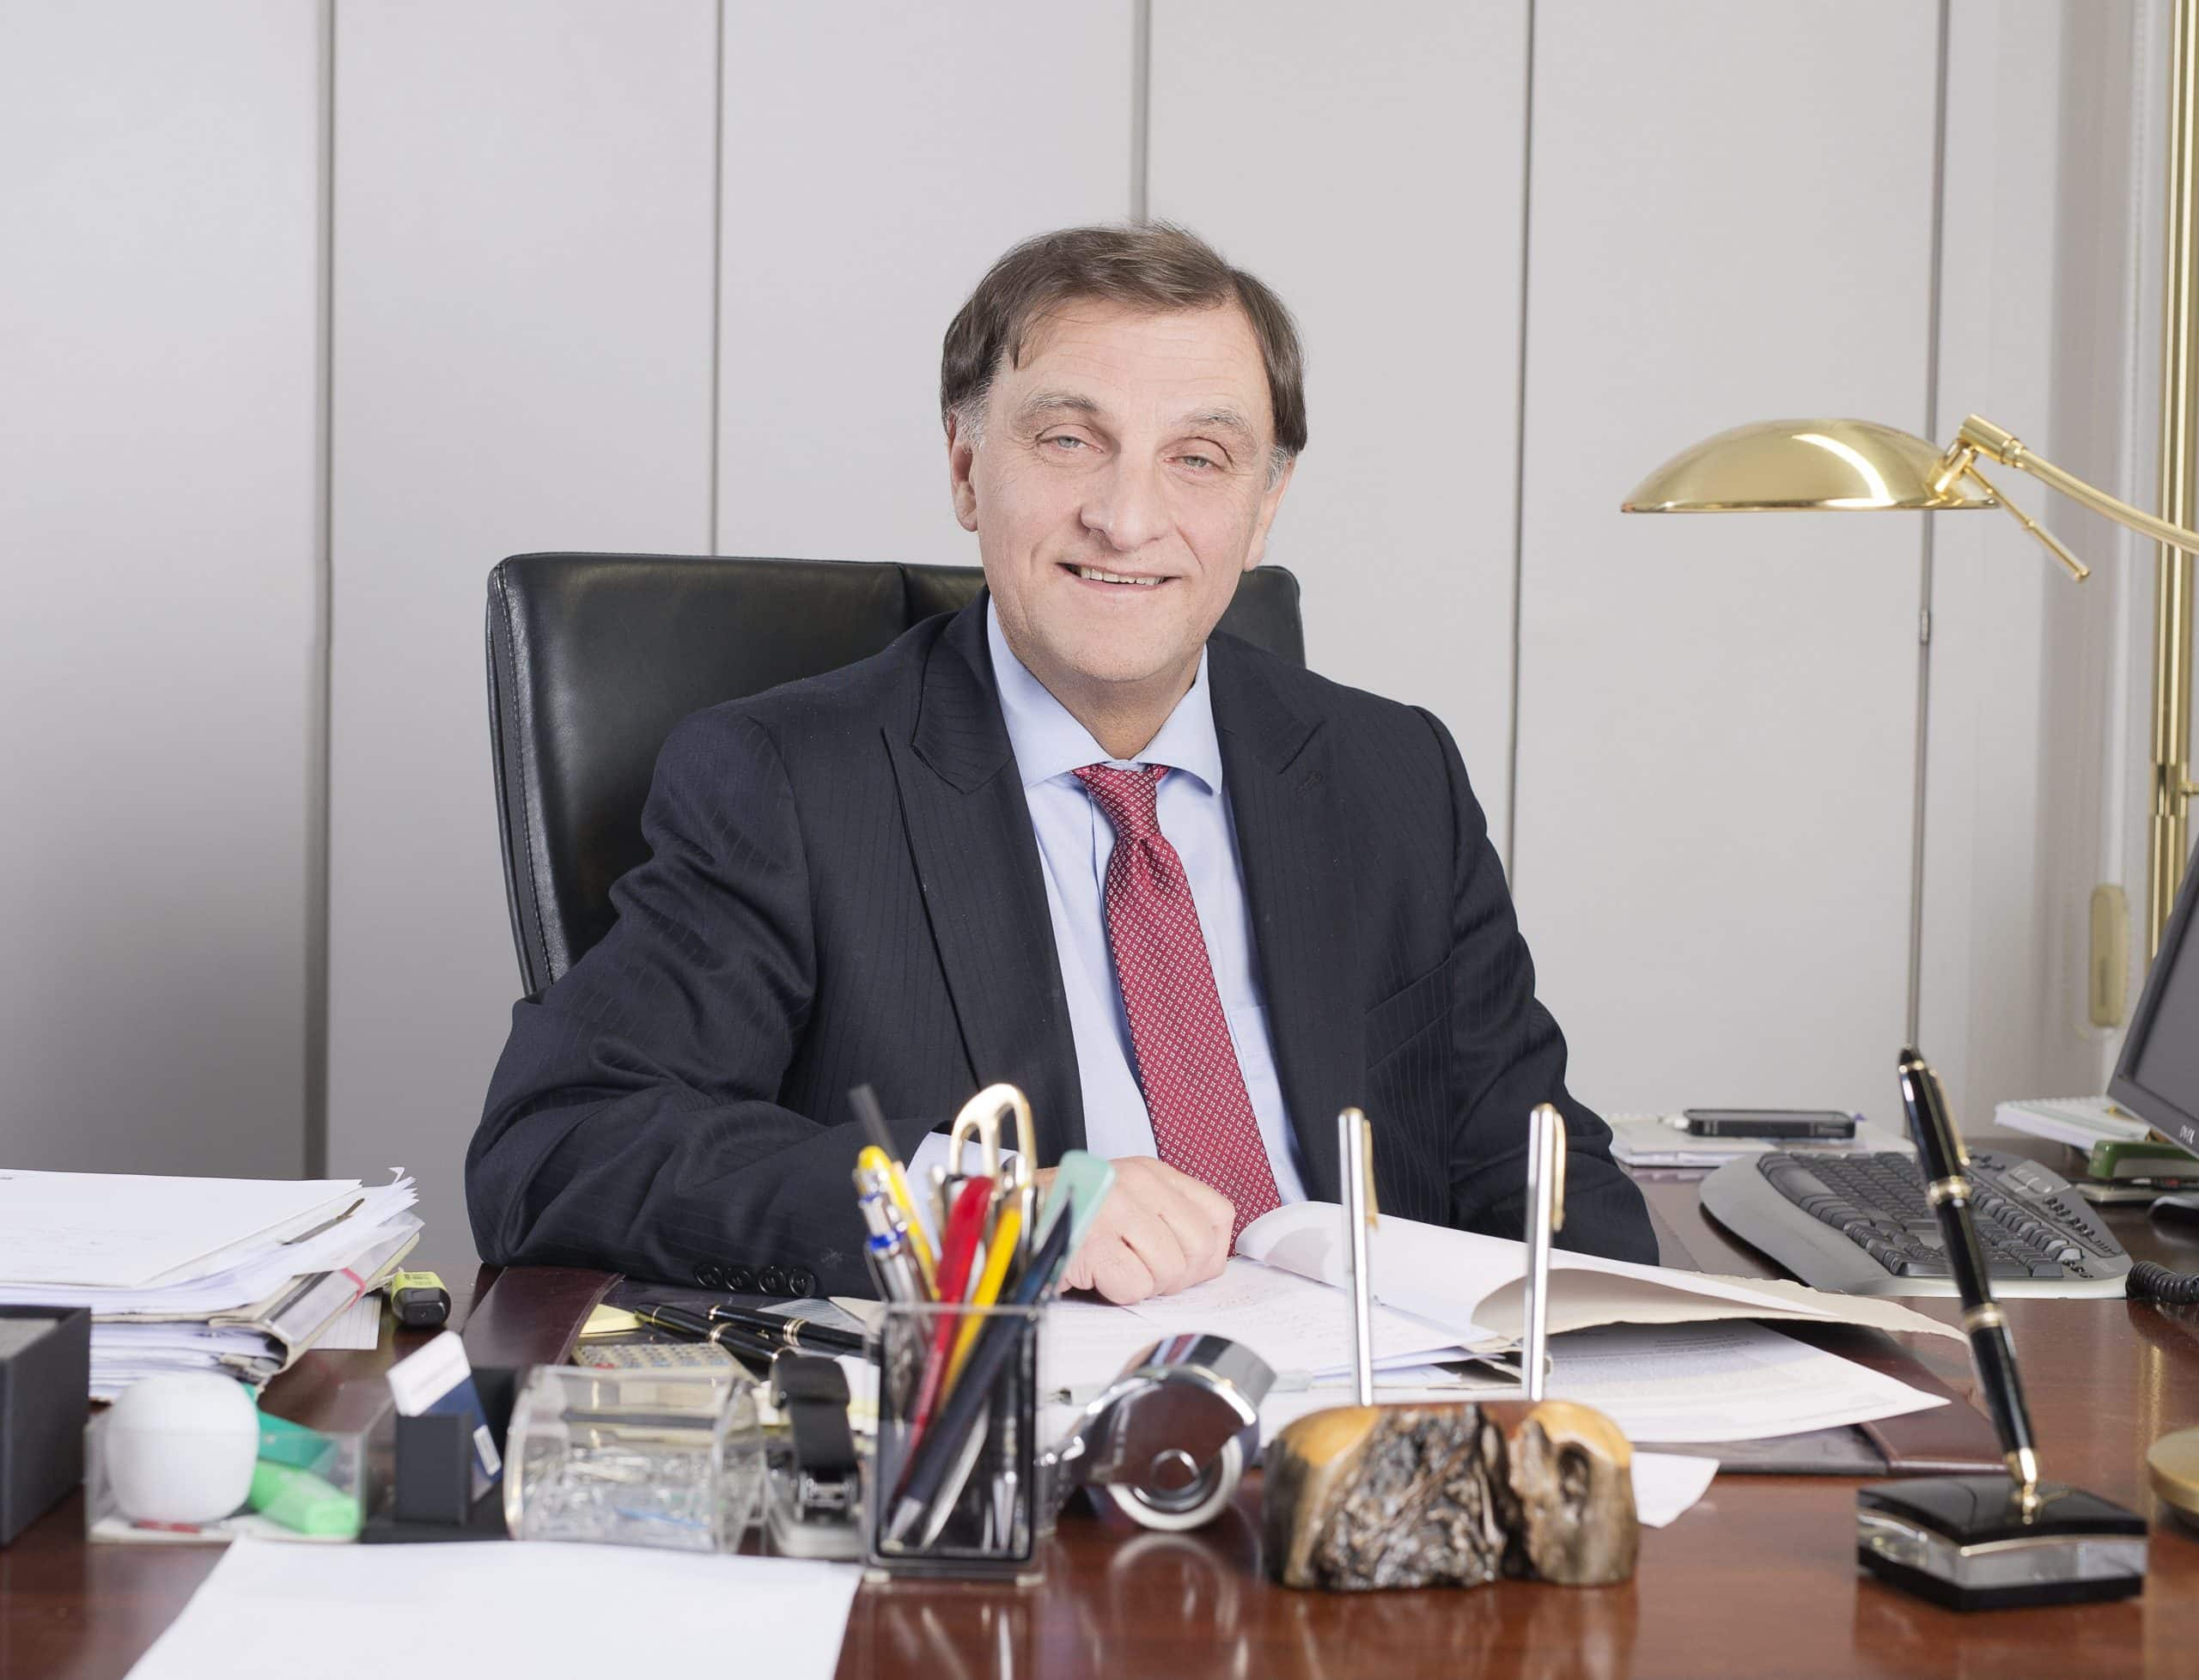 Dr. Trutz Graf Kerssenbrock